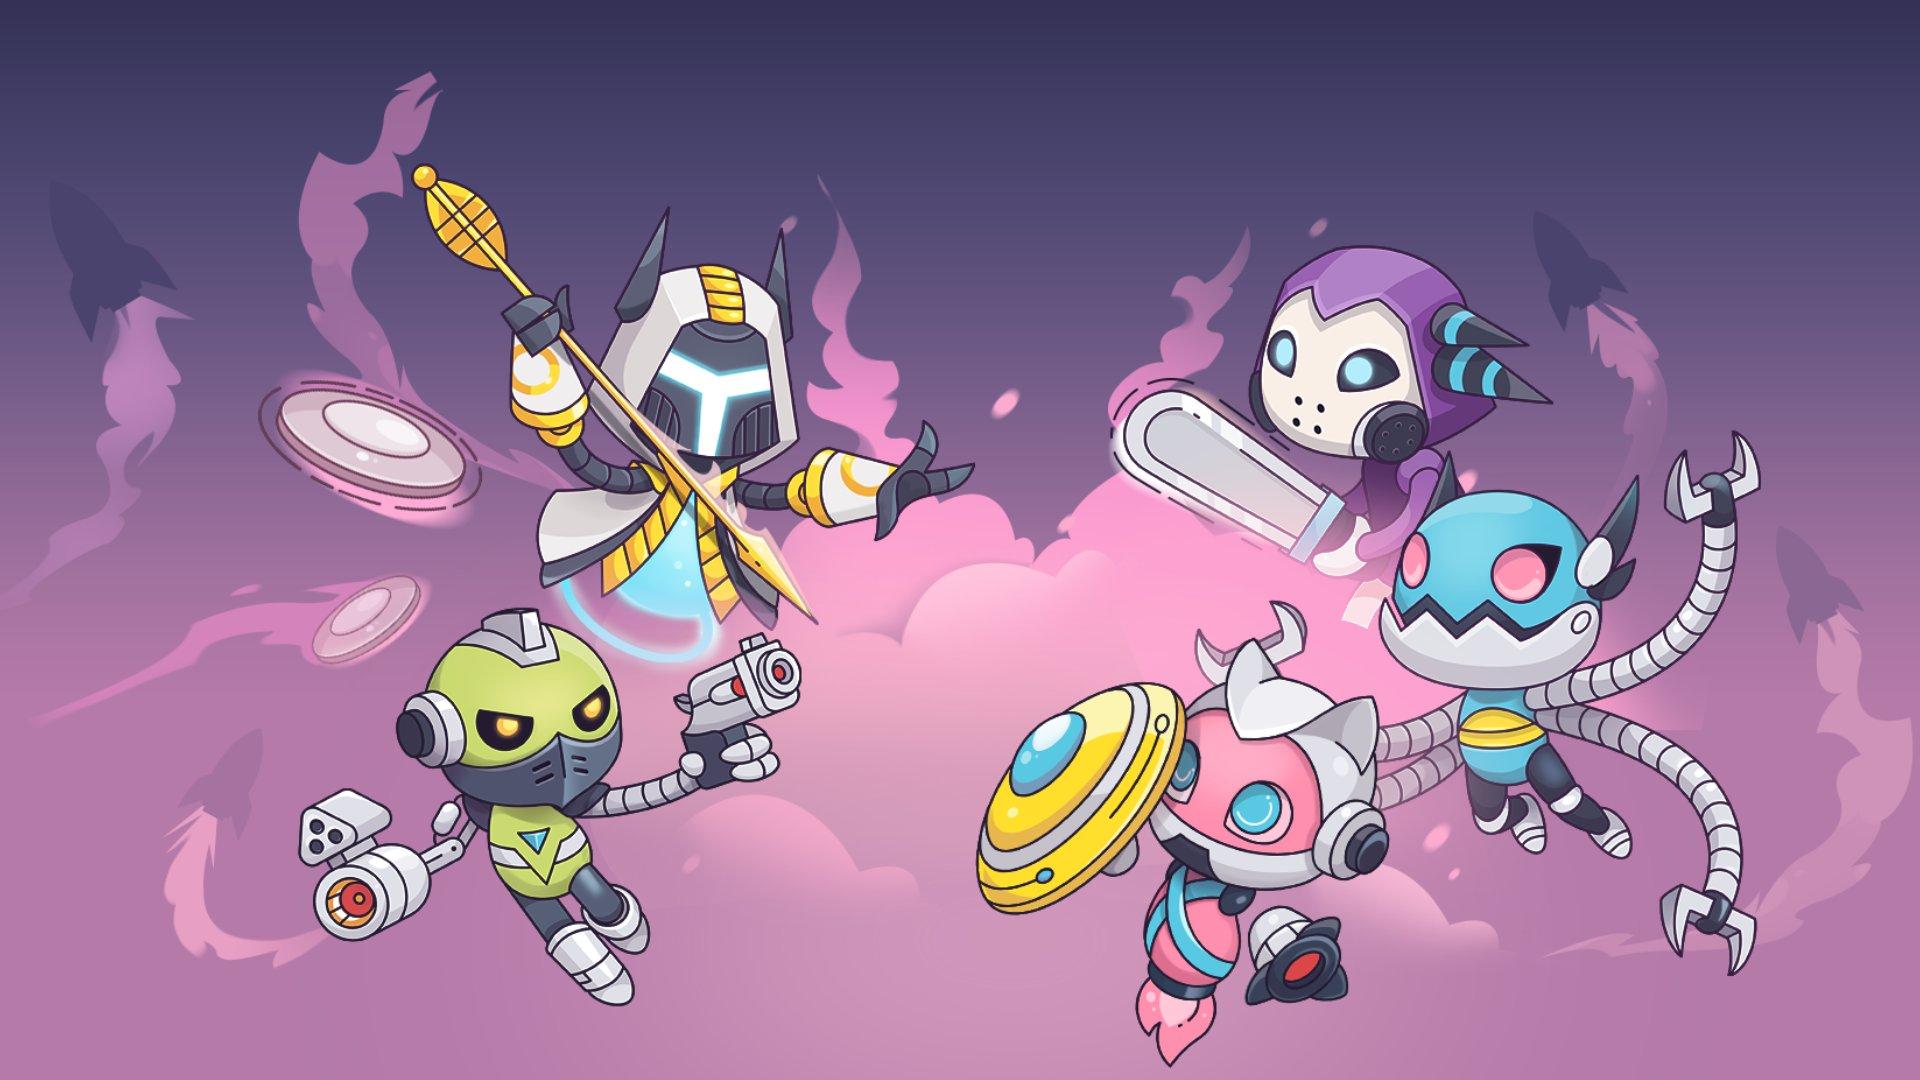 cryptobots nft 2017 returns